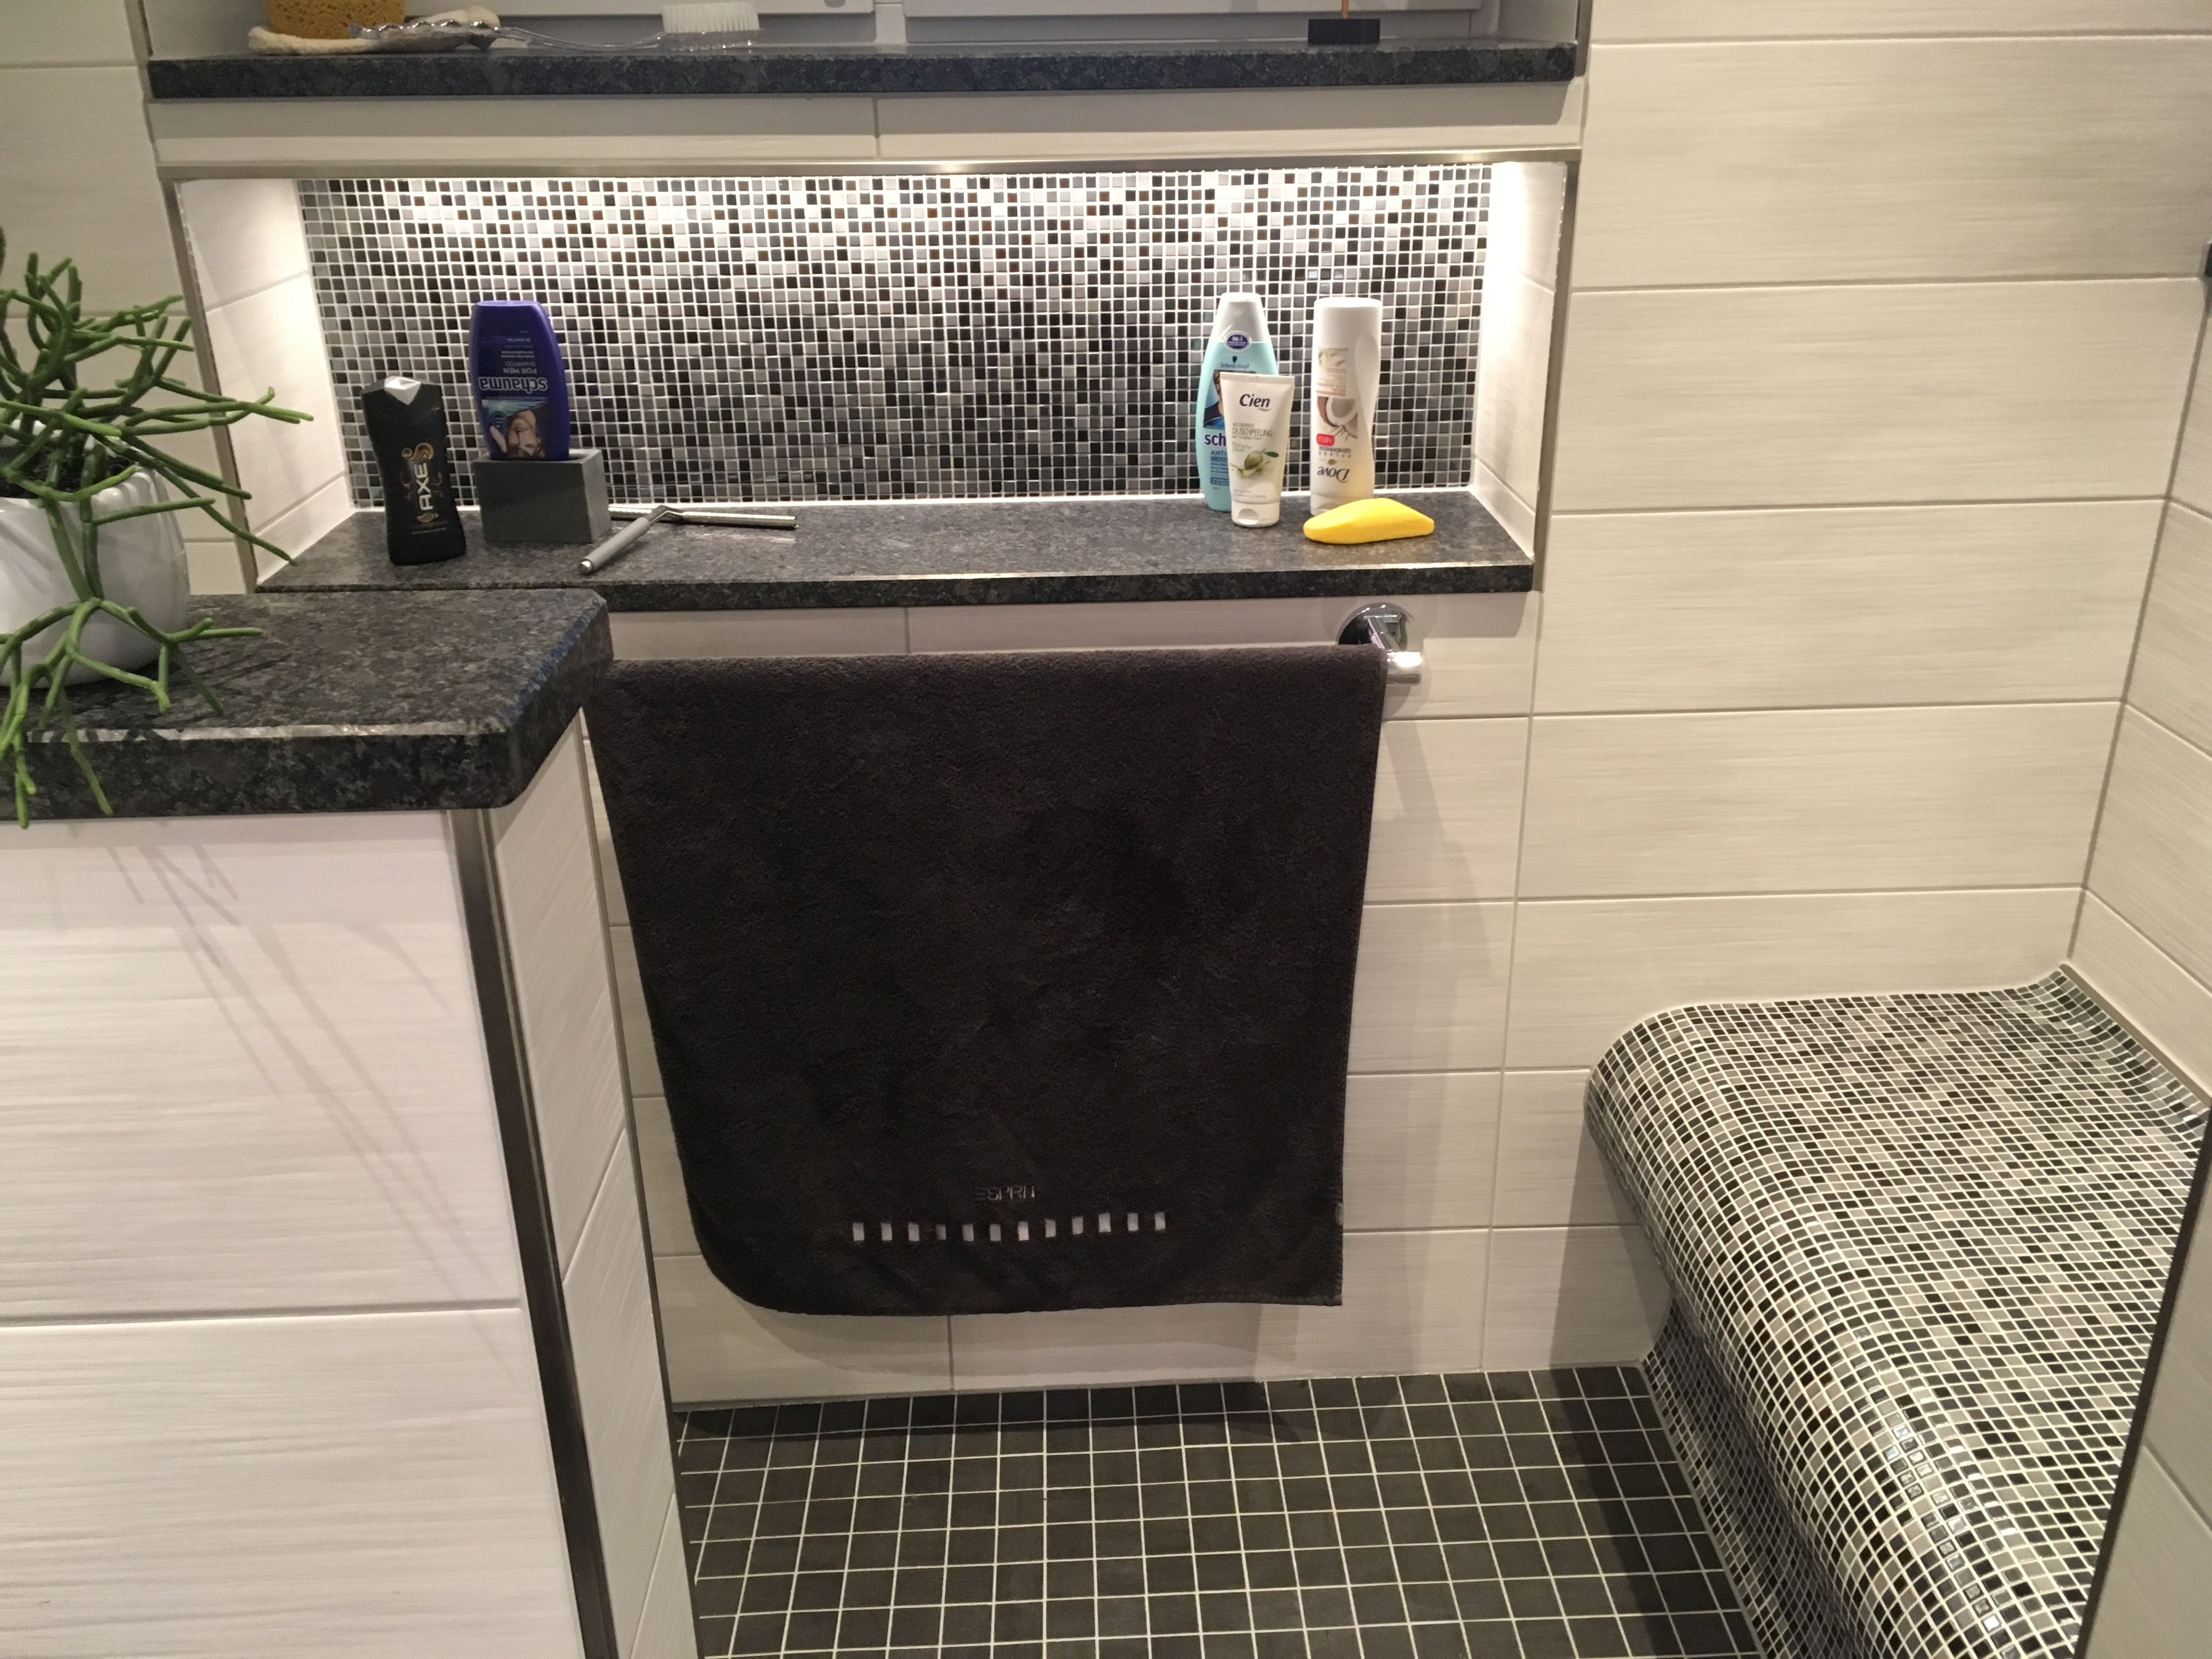 Ensuite badezimmerdesign pin by ingo kaufmann on badezimmer  pinterest